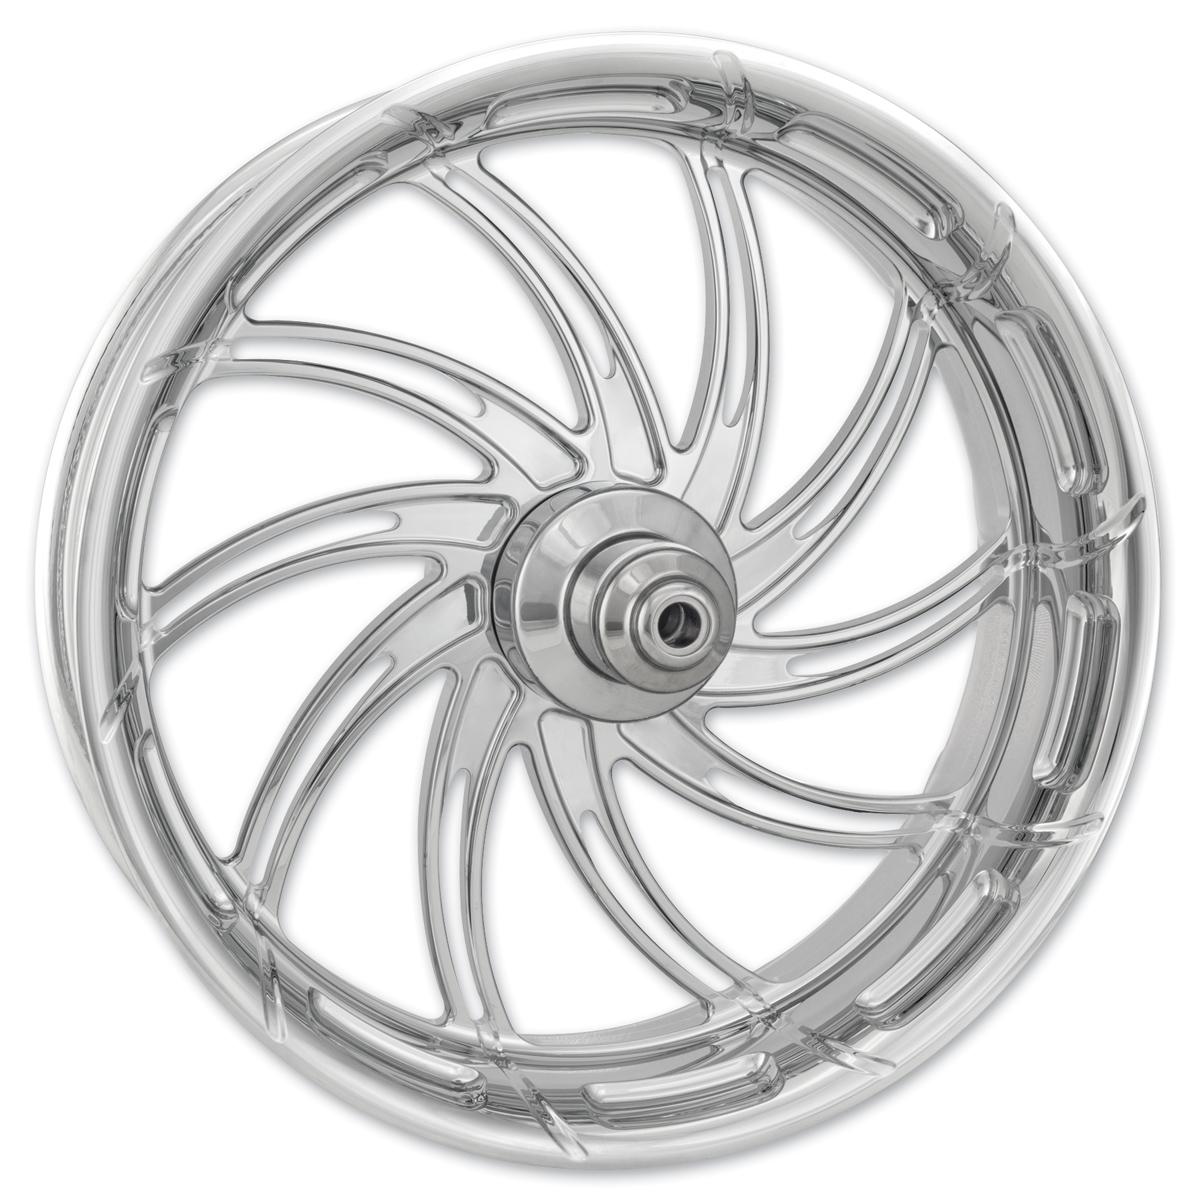 Performance Machine Supra Chrome Front Wheel 18x3.5 Dual disc